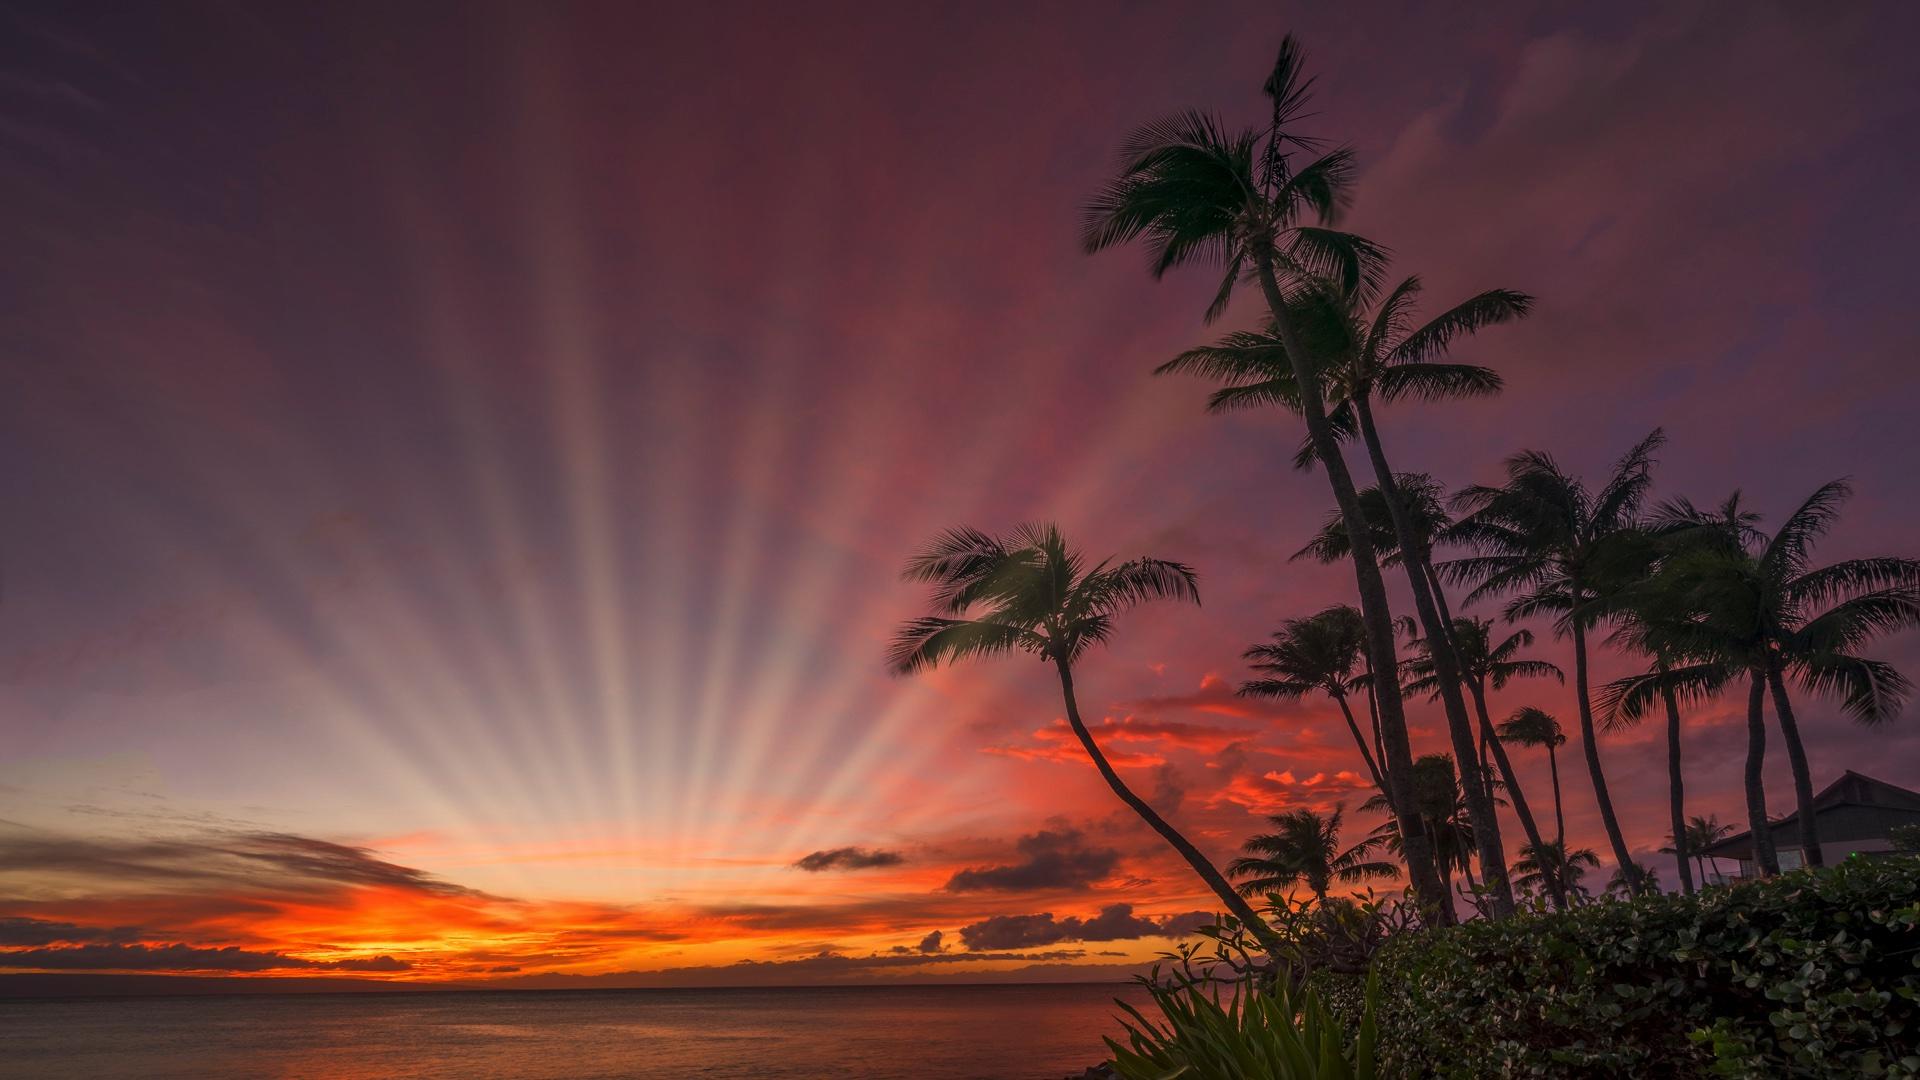 Sunset Napili Kai2sunrays